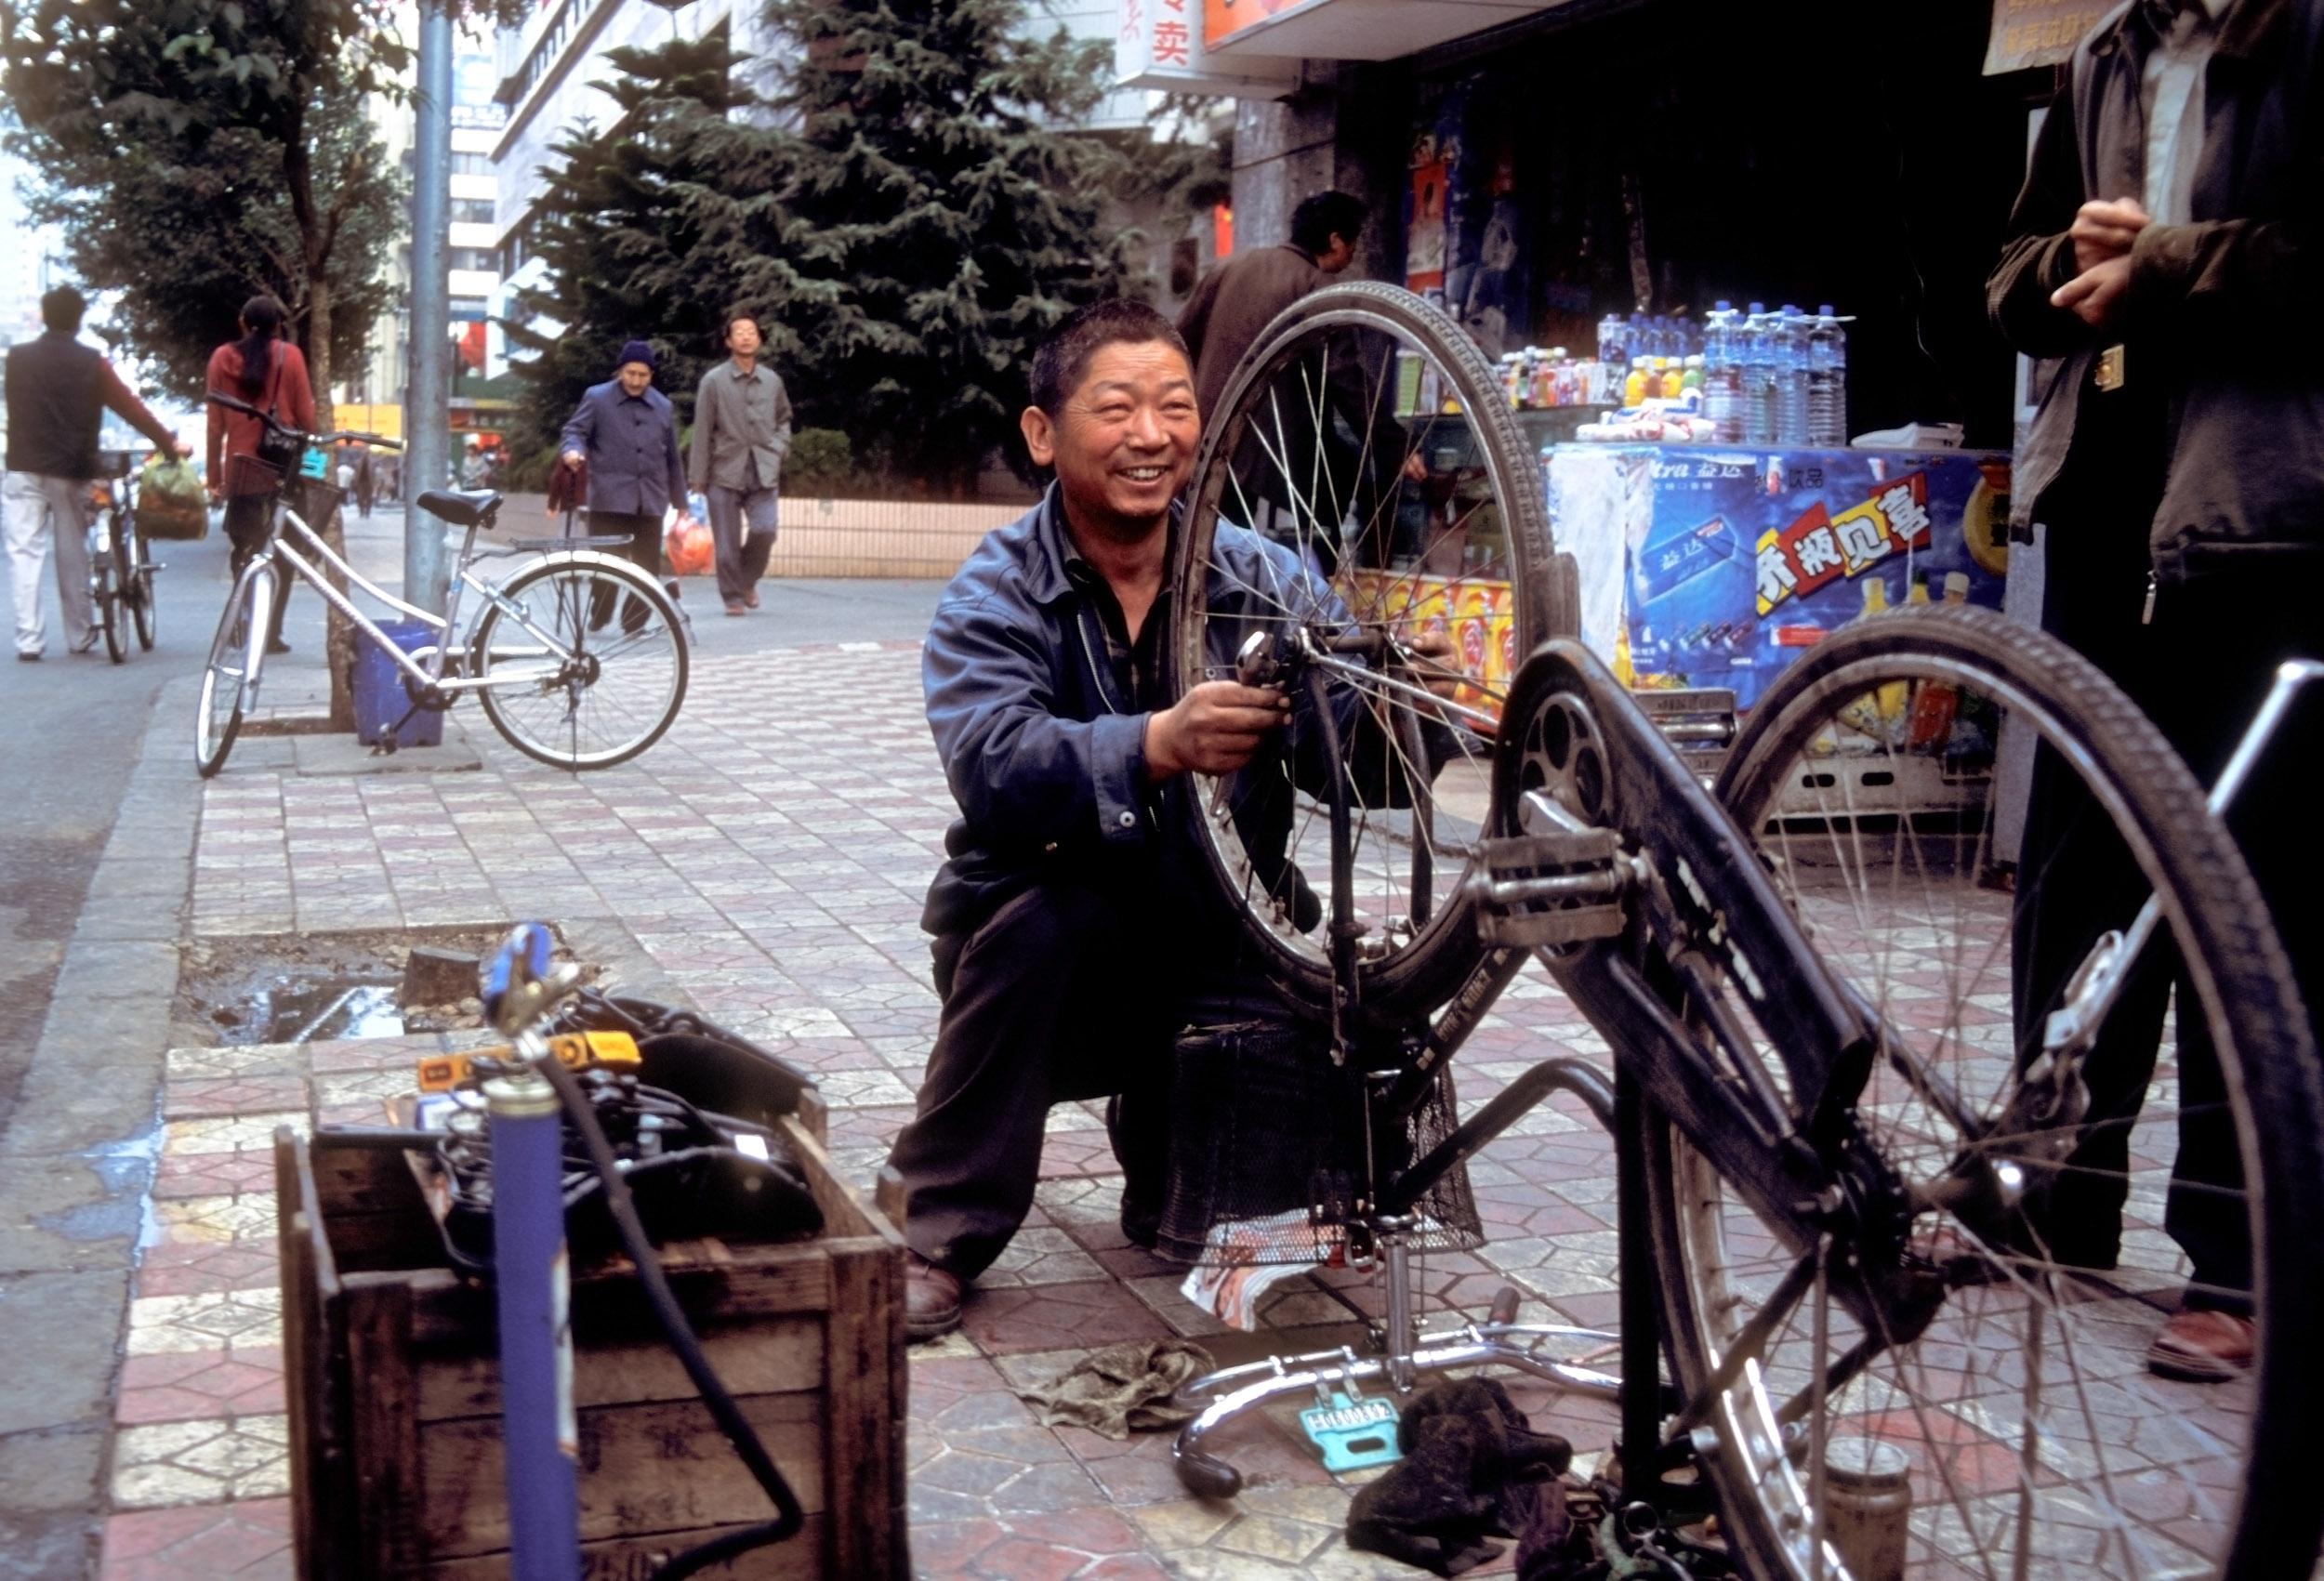 © Kevin Landwer-Johan. Conserto de bicicletas na rua na China